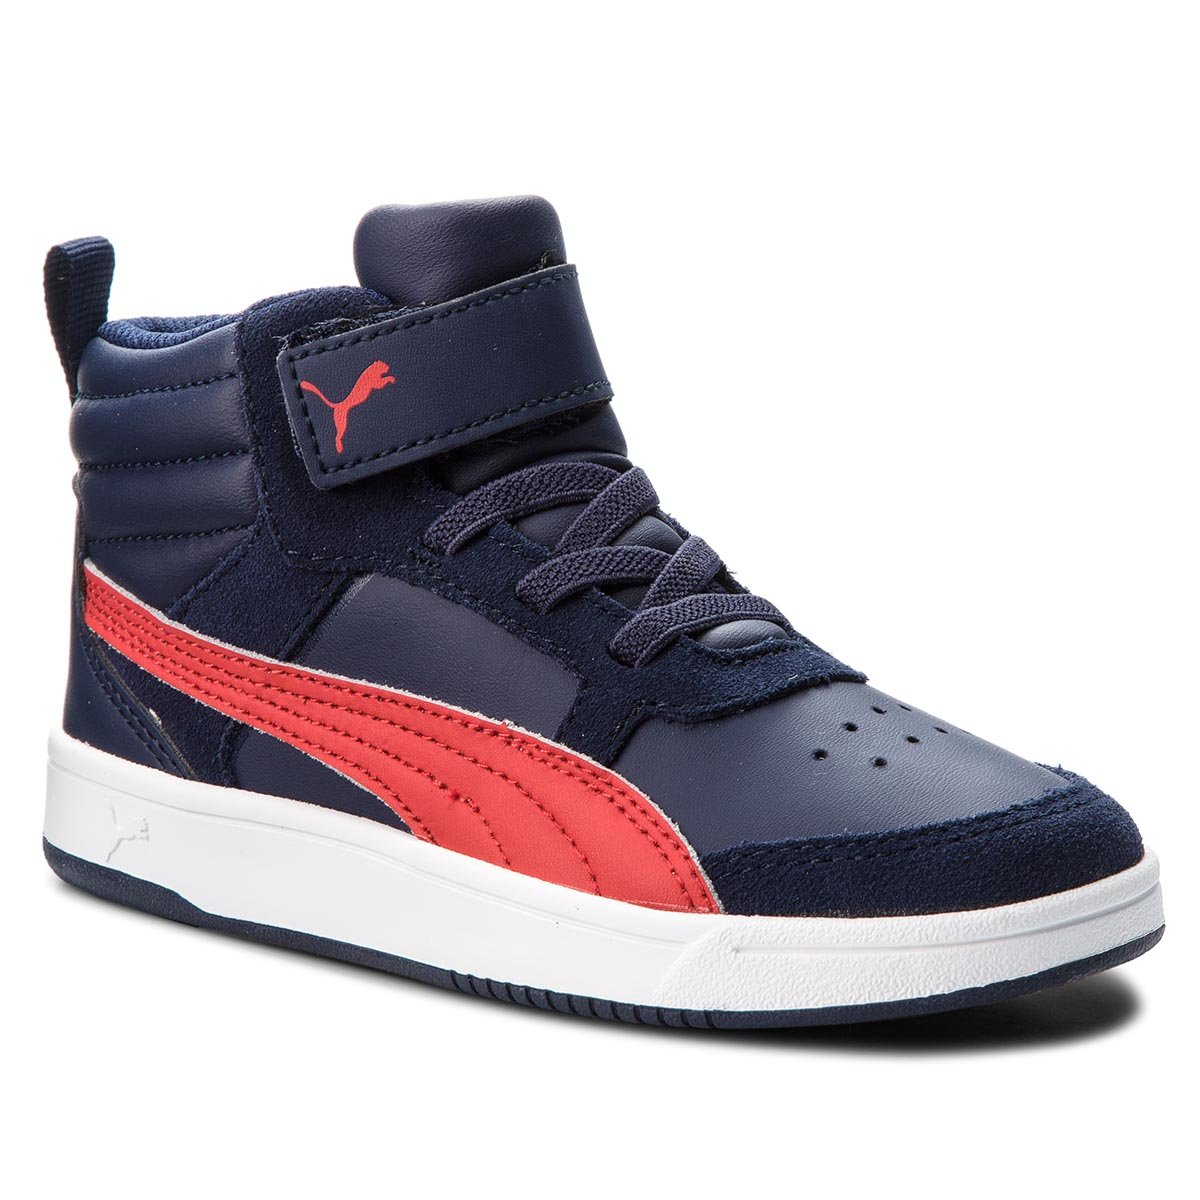 012015fddeb Puma Rebound Street v2 V Inf 363918 08 Μπλε | Apostolidis Shoes